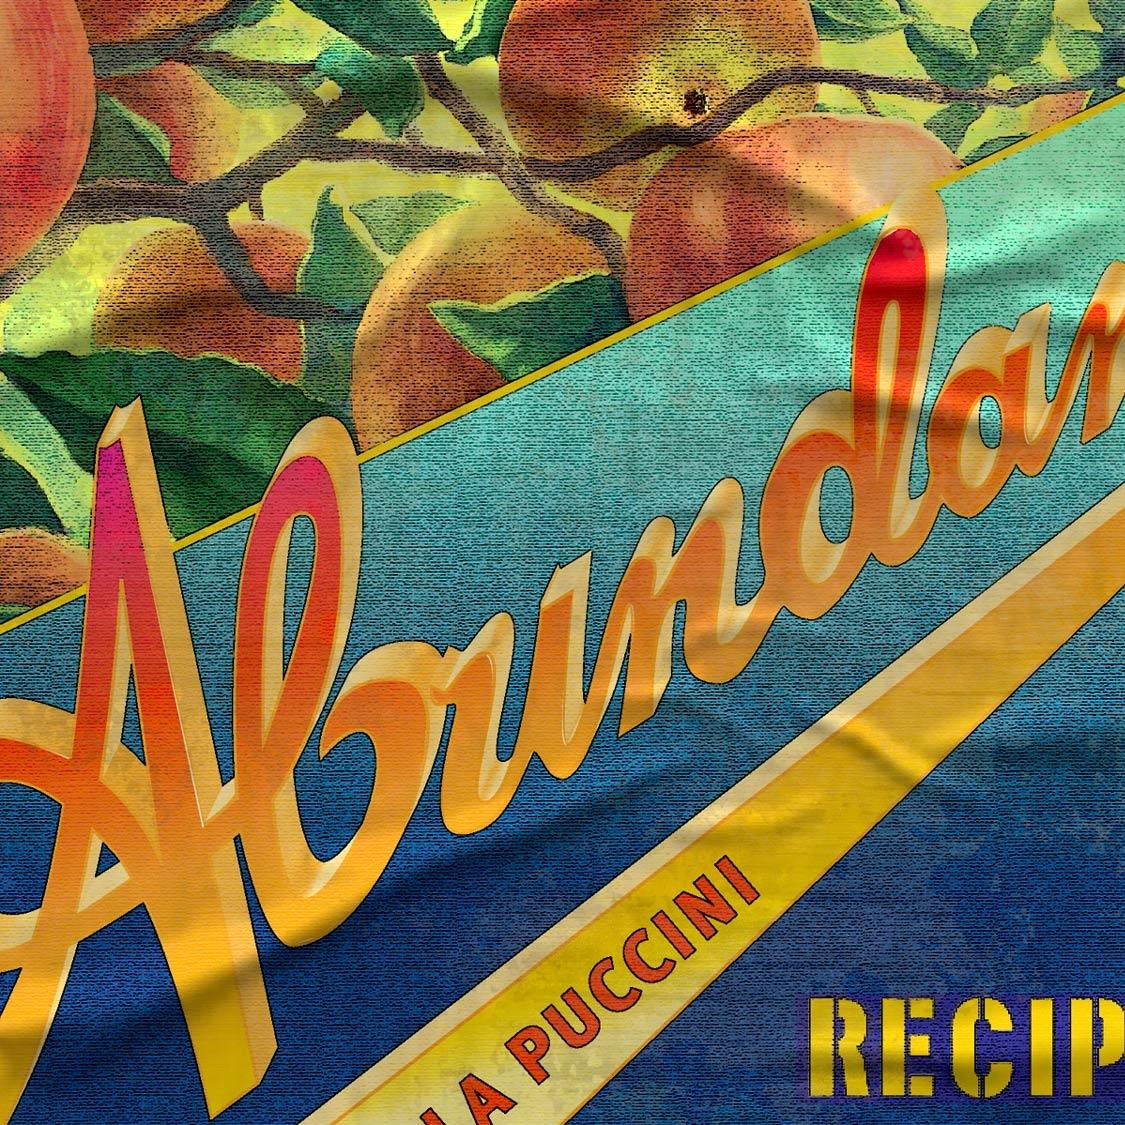 Abundance: Recipes for a Seasonal Glut